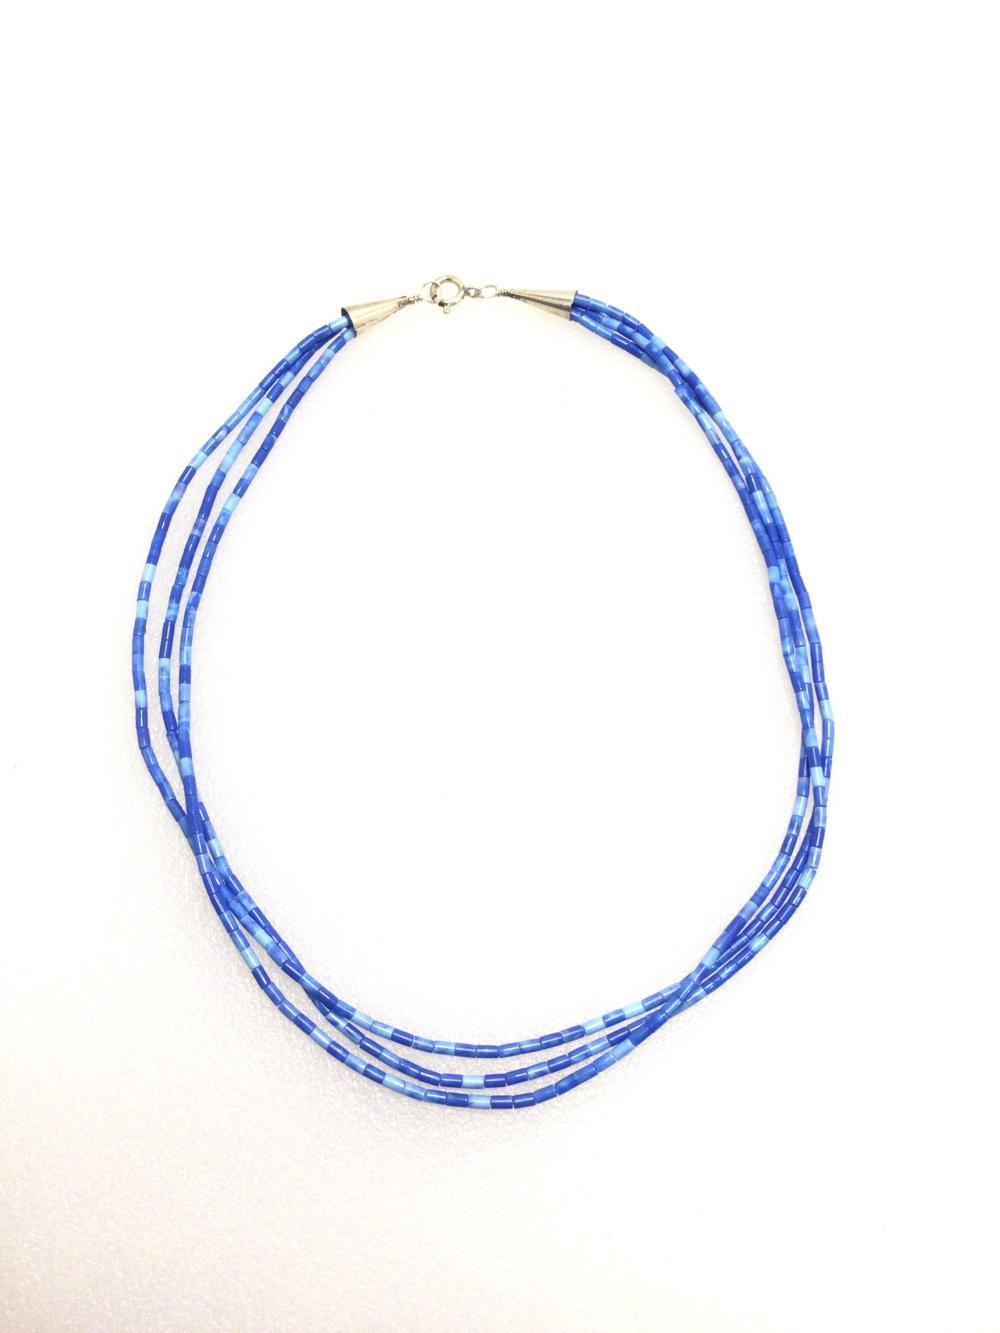 G: Handmade Blue Beaded Necklace